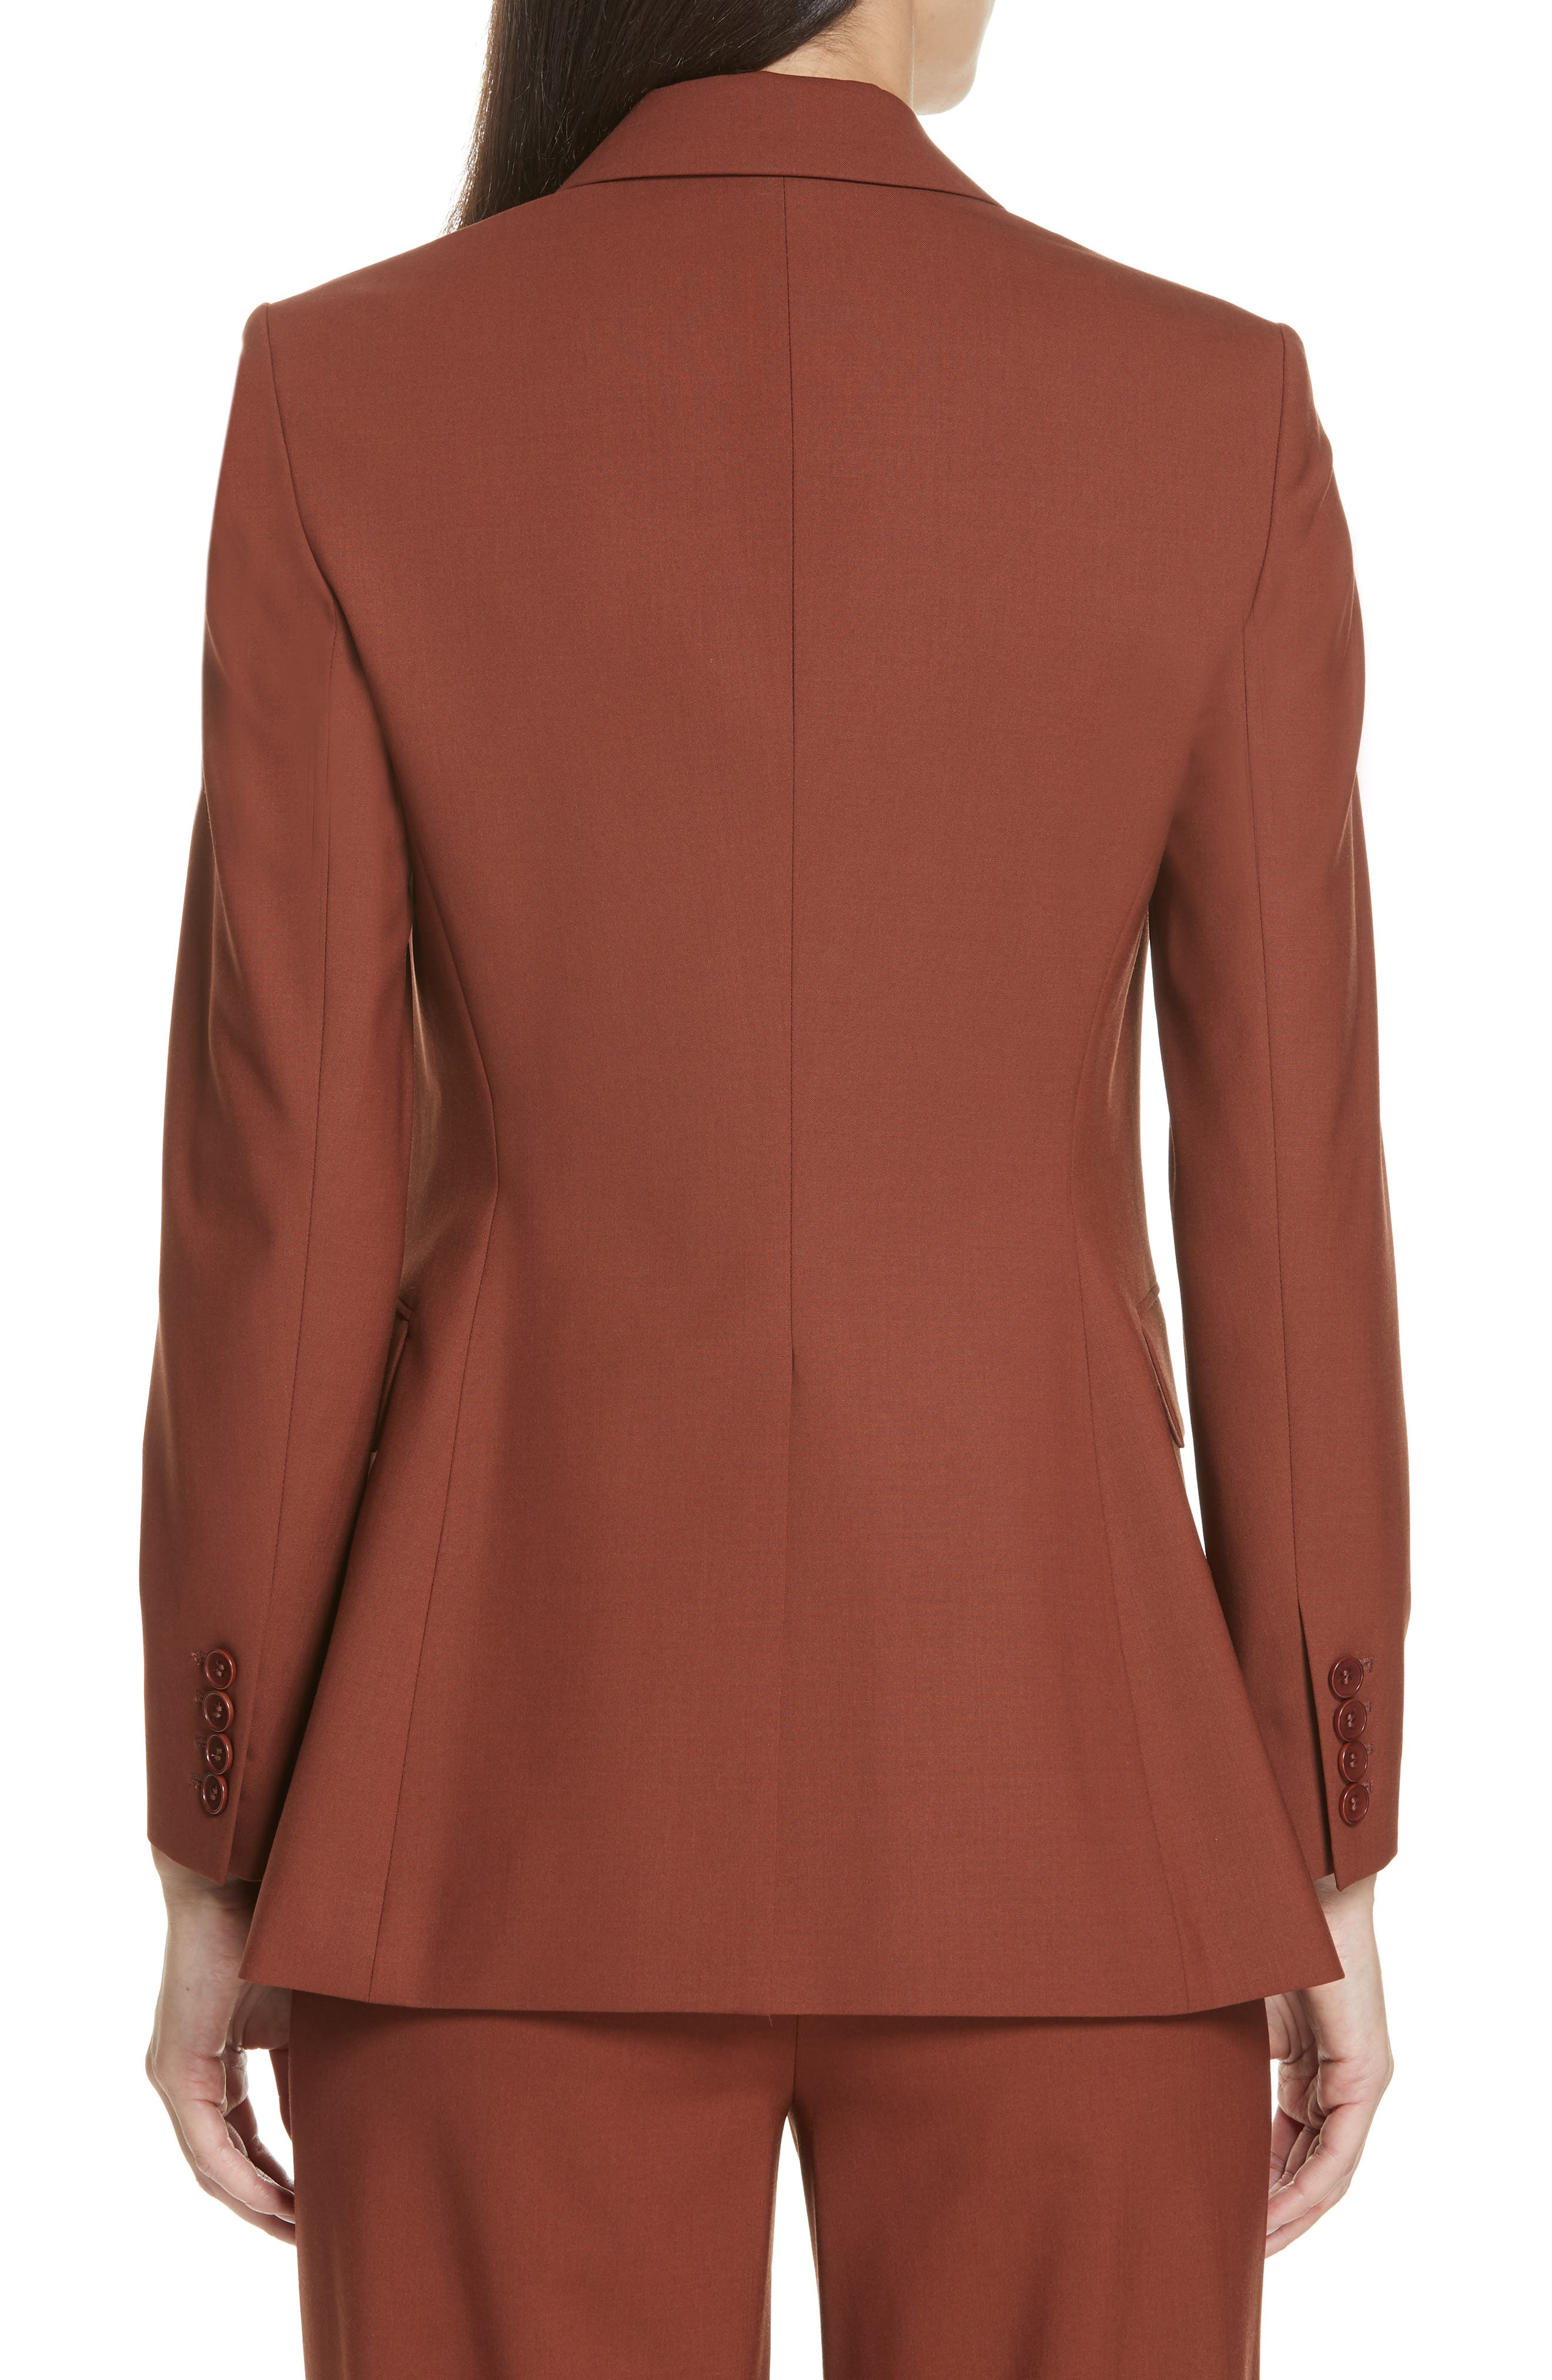 Etienette B Good Wool Suit Jacket,                             Alternate thumbnail 15, color,